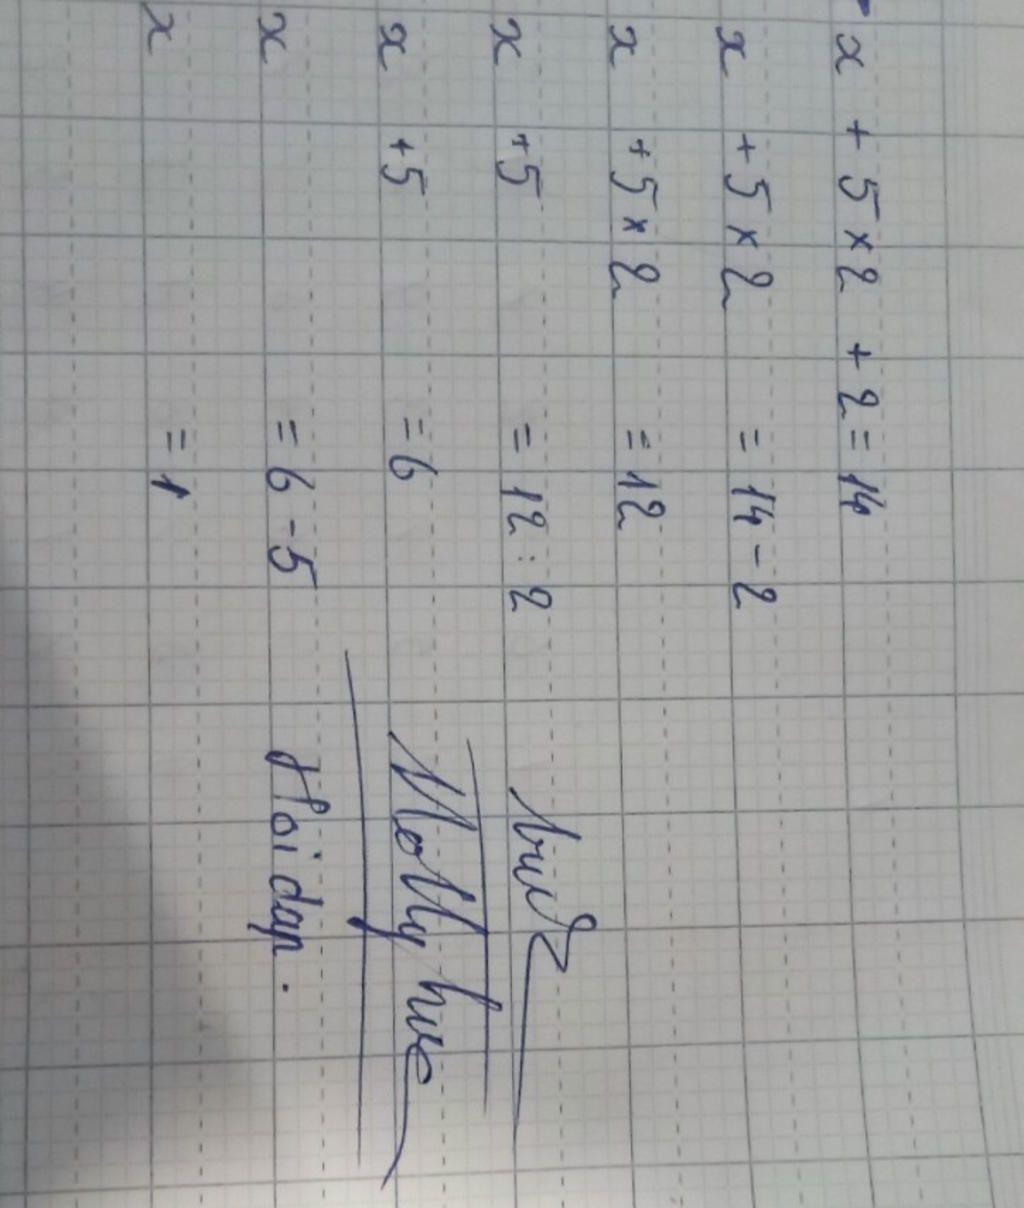 tim-5-2-2-14